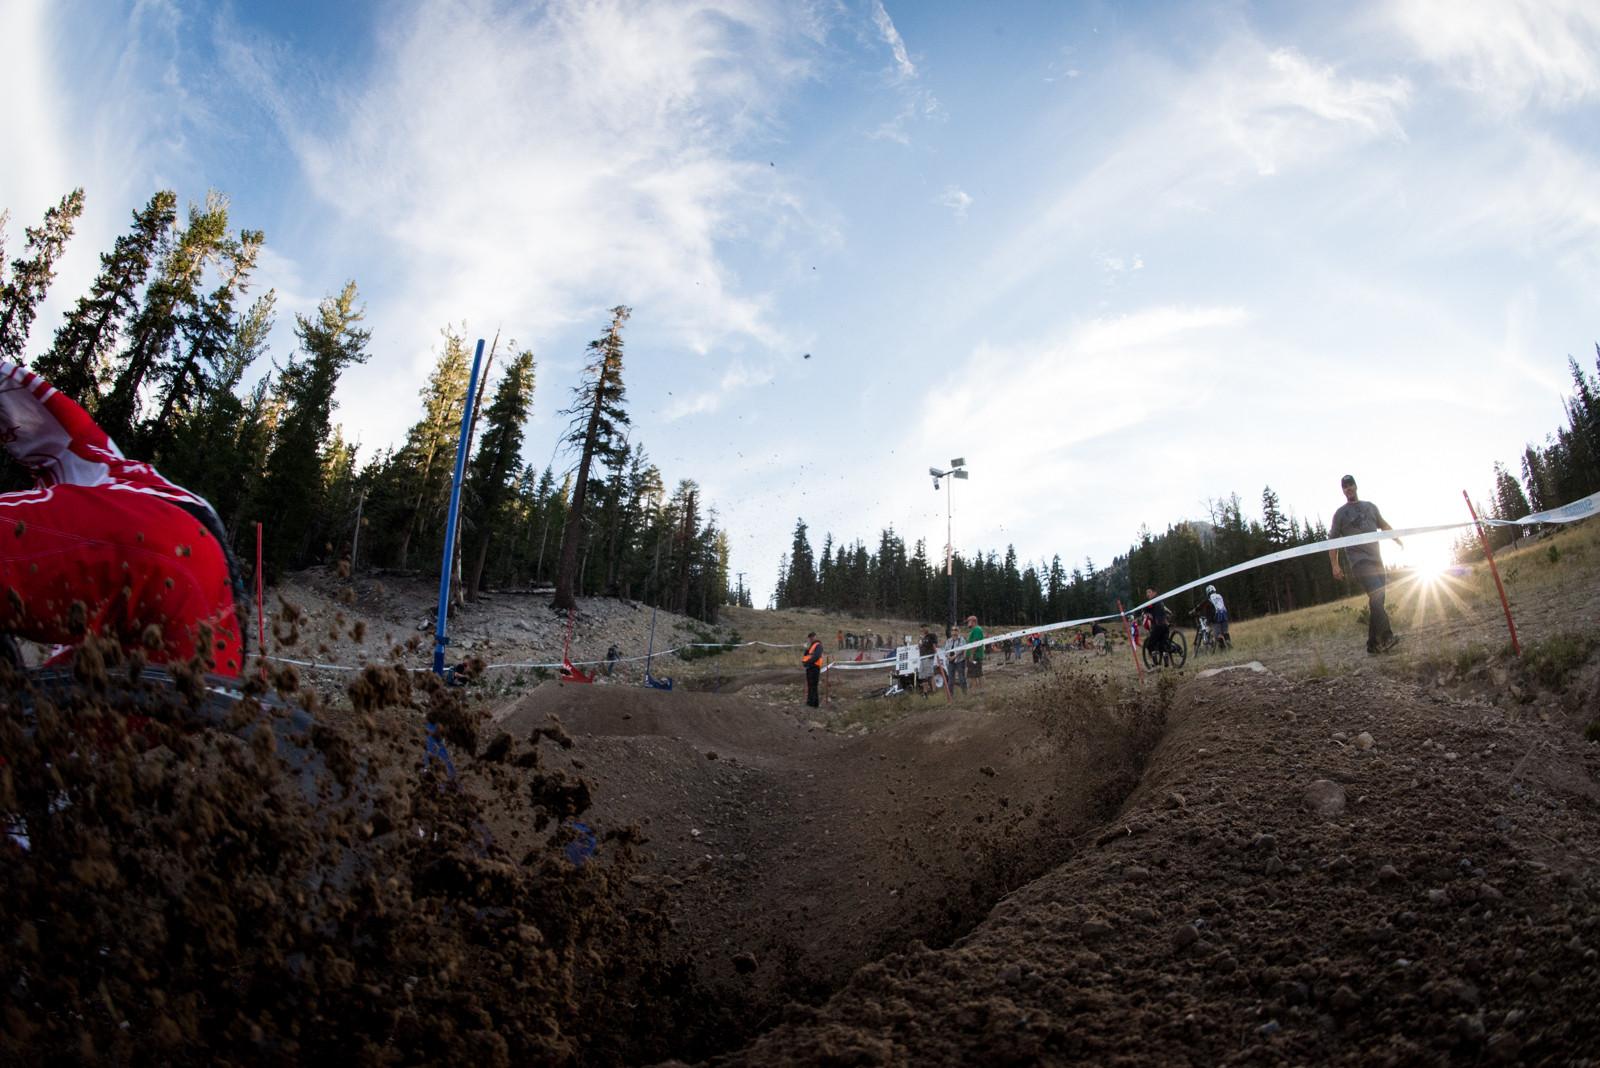 Mitch Ropelato - Mammoth Mountain Kamikaze Bike Games Dual Slalom - Mountain Biking Pictures - Vital MTB